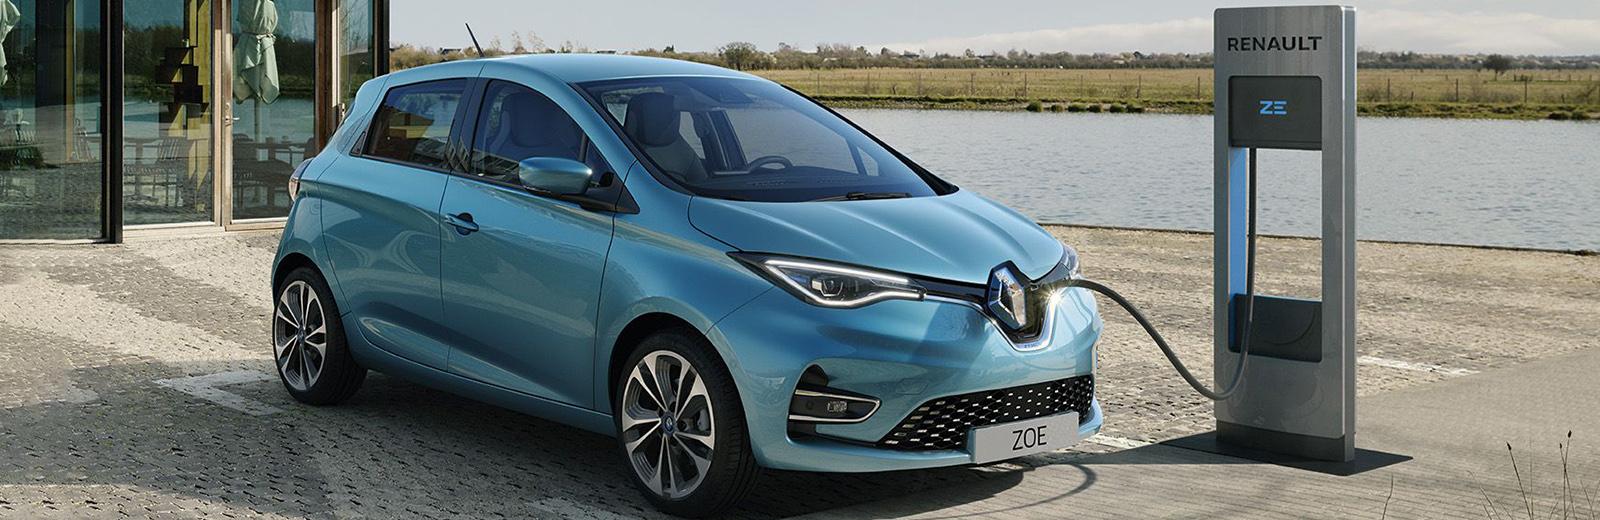 Renault Zoe electric cheap